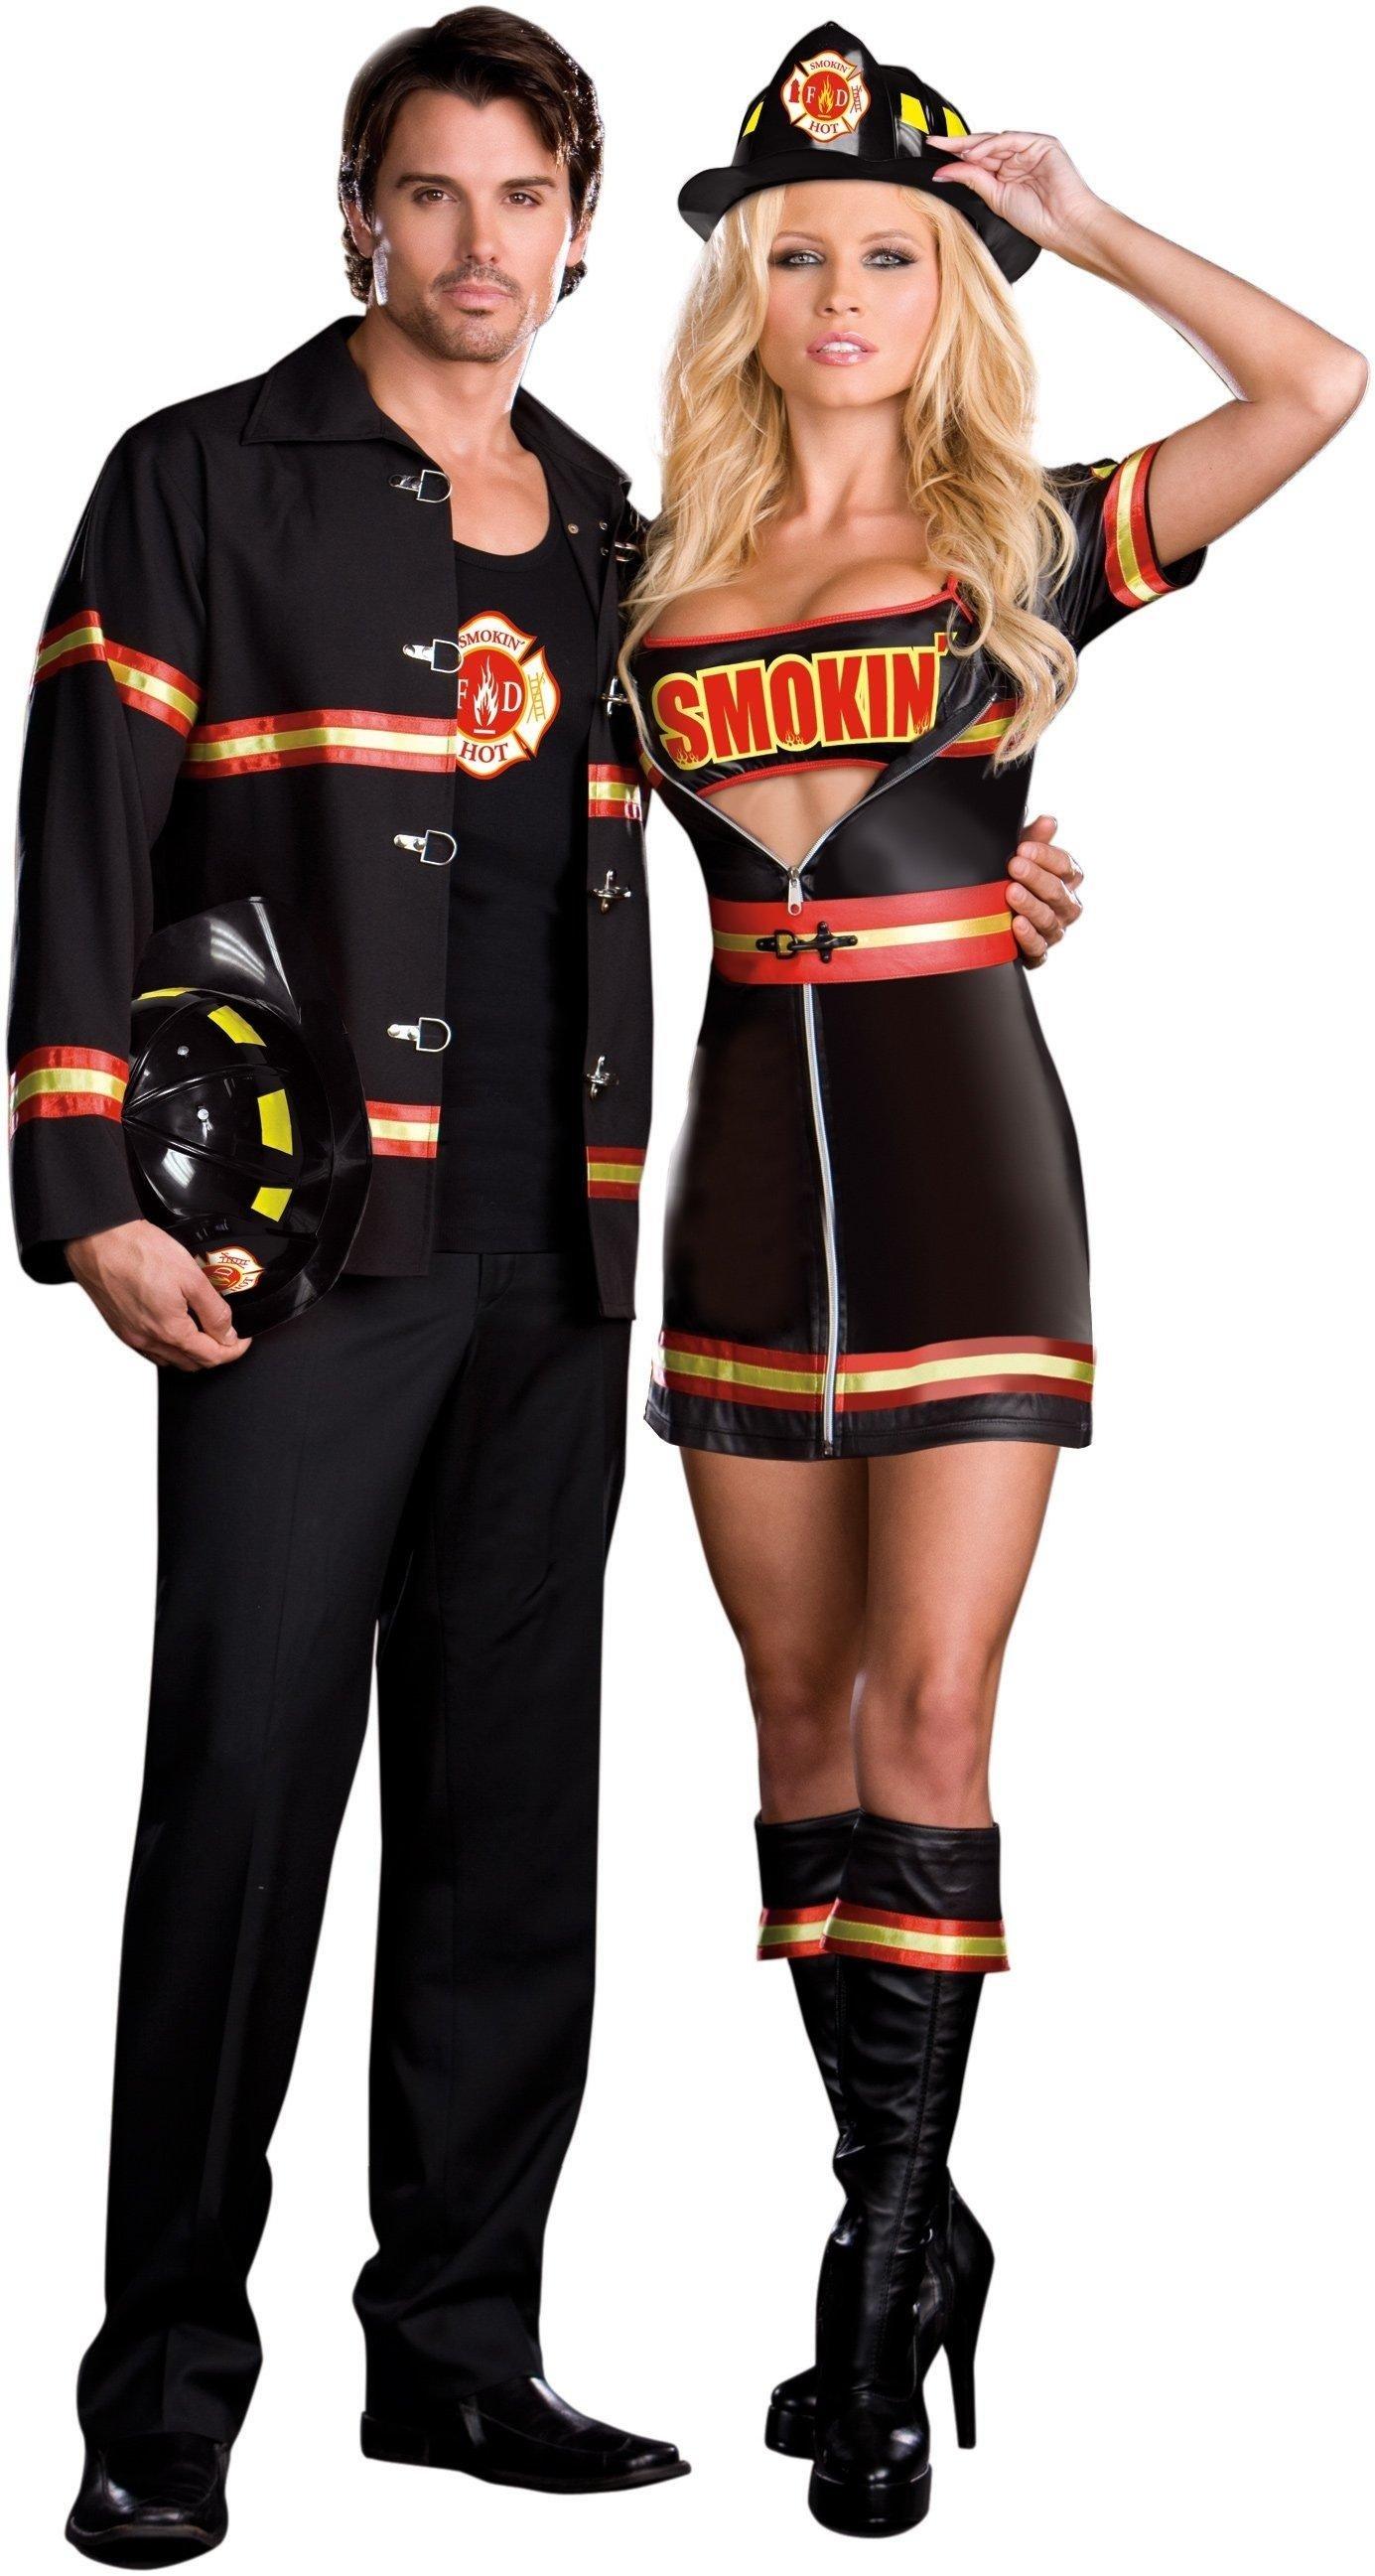 10 Spectacular Cool Couple Halloween Costume Ideas 35 couples halloween costumes ideas inspirationseek 6 2021